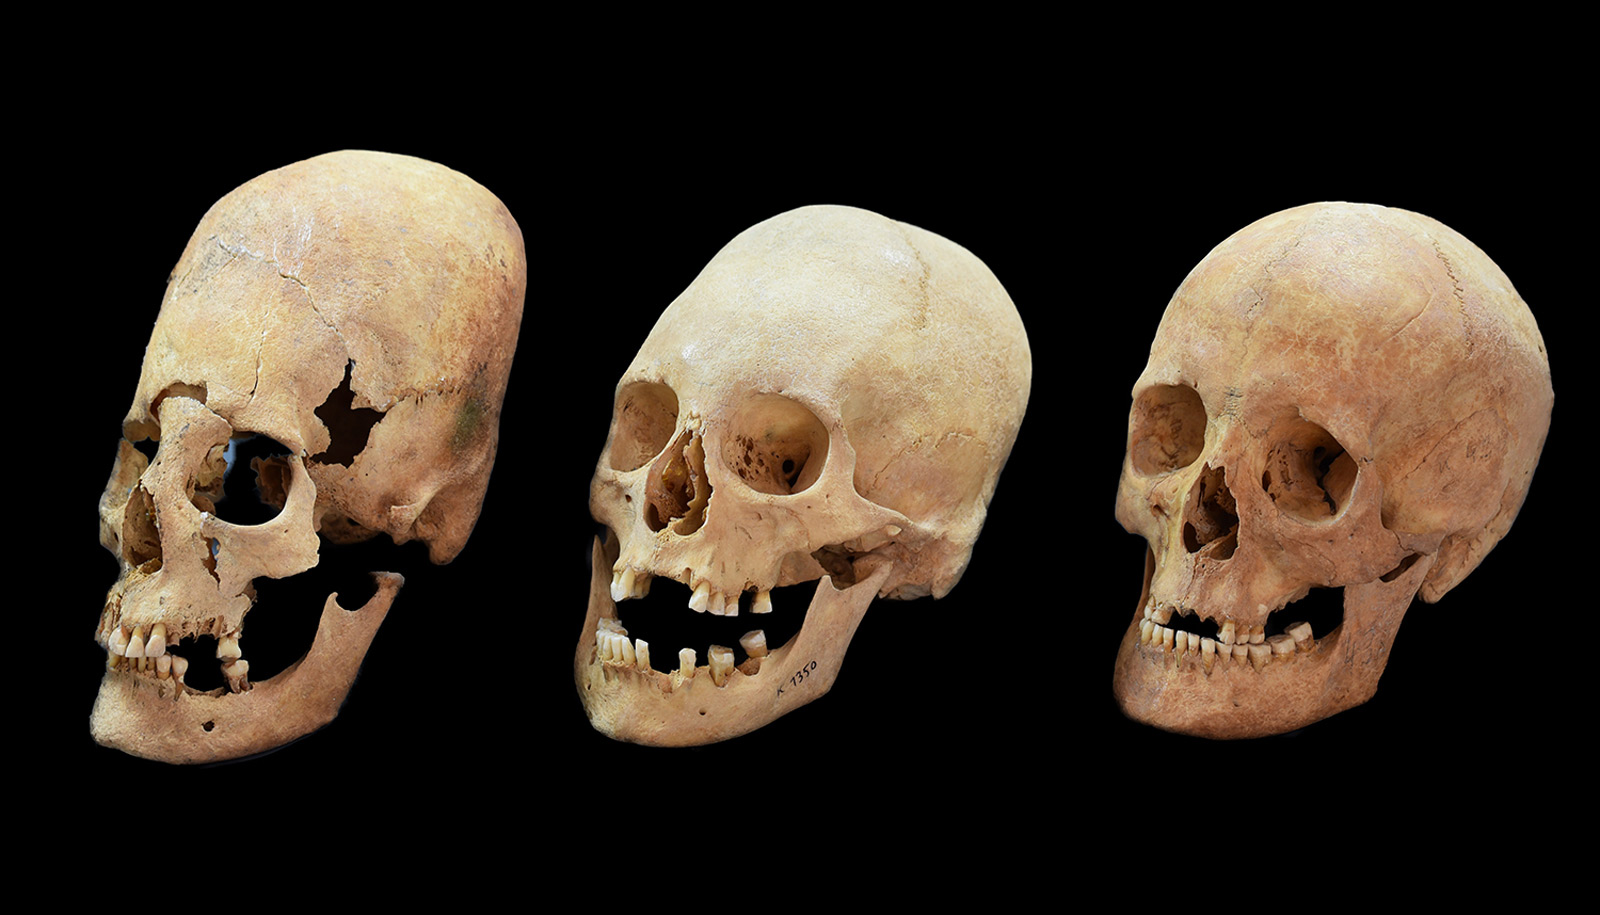 deformed, intermediate, and normal skulls